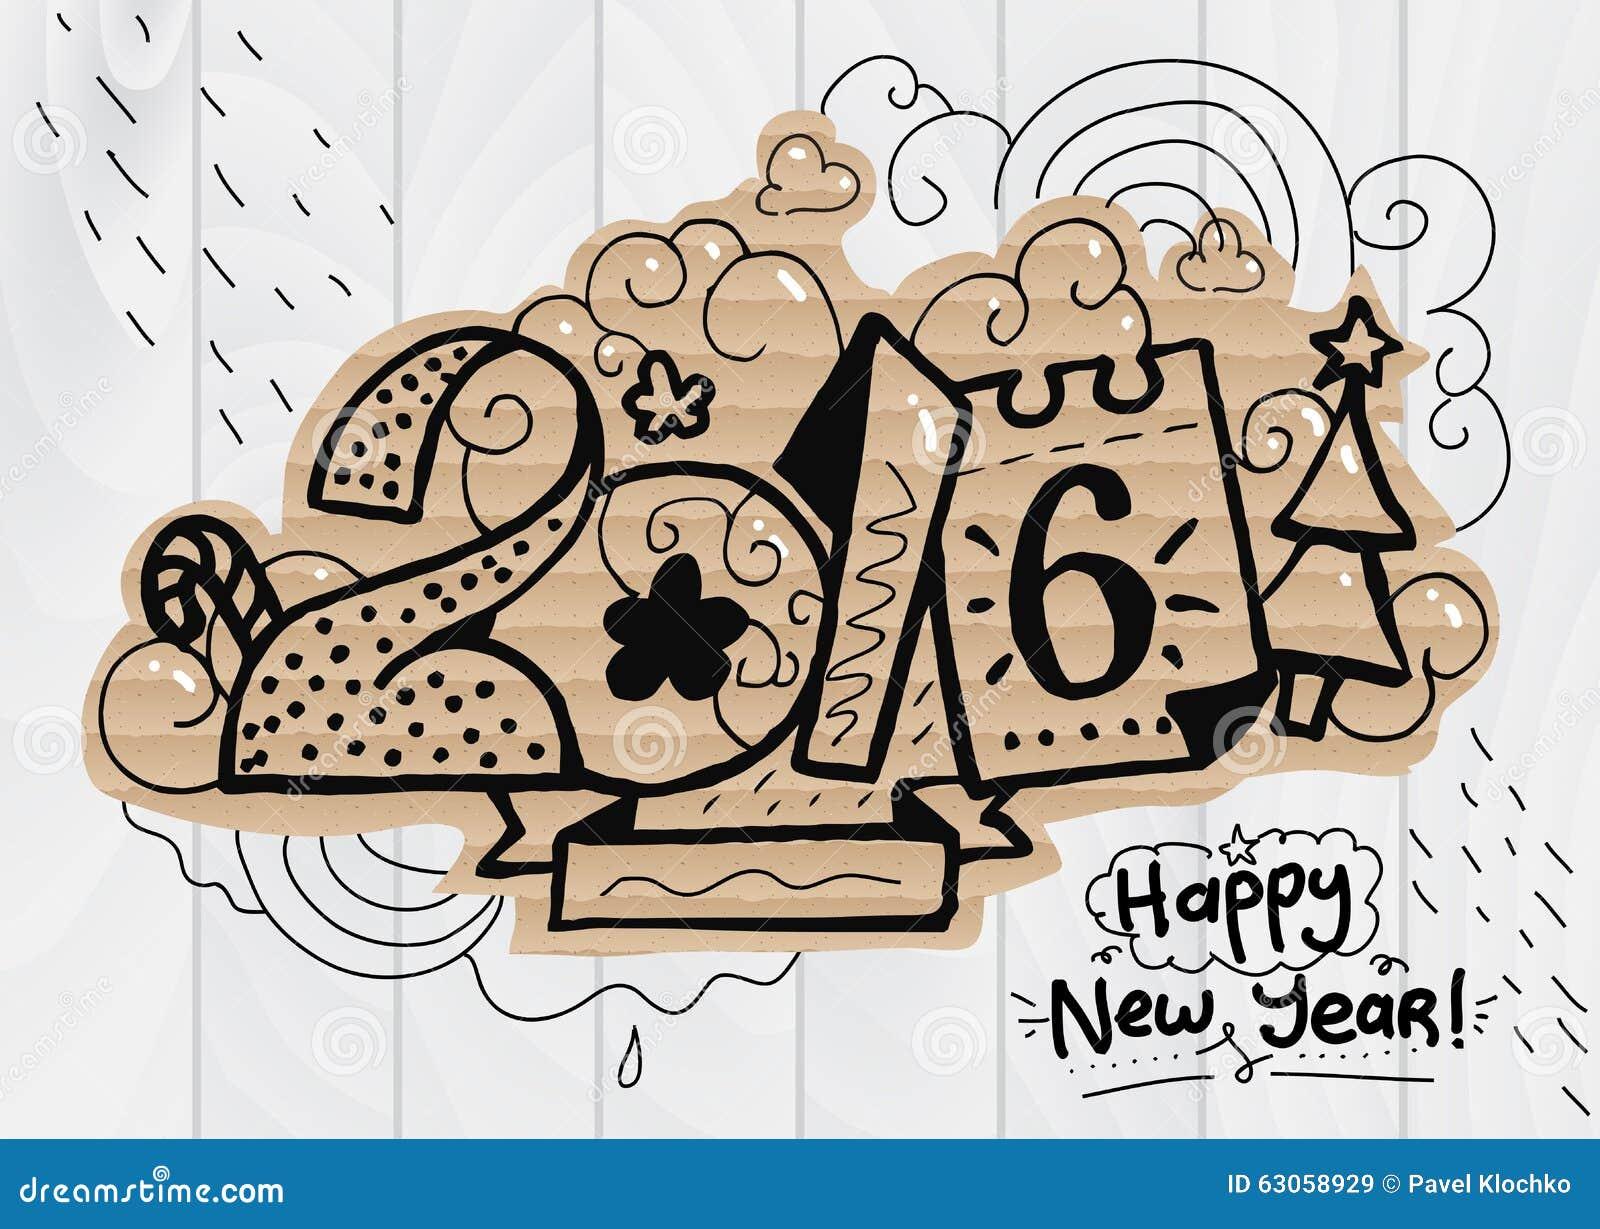 Happy New Year Illustration 2016 Font Hand Drawn Stock